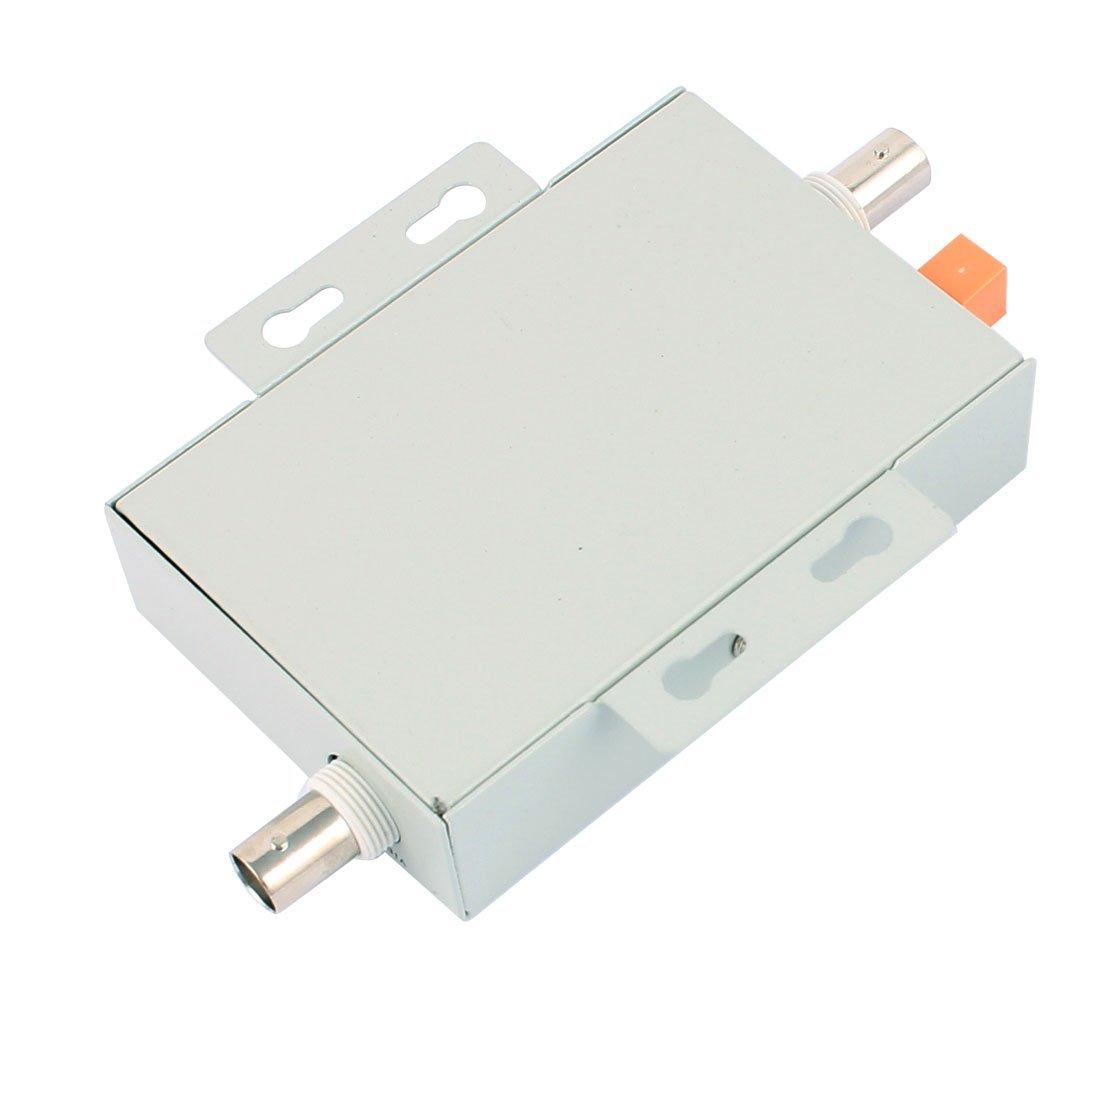 Amazon.com: DealMux CCTV Camera Signal Booster BNC Coaxial Cable amplificador de vídeo para câmera de CFTV: Electronics